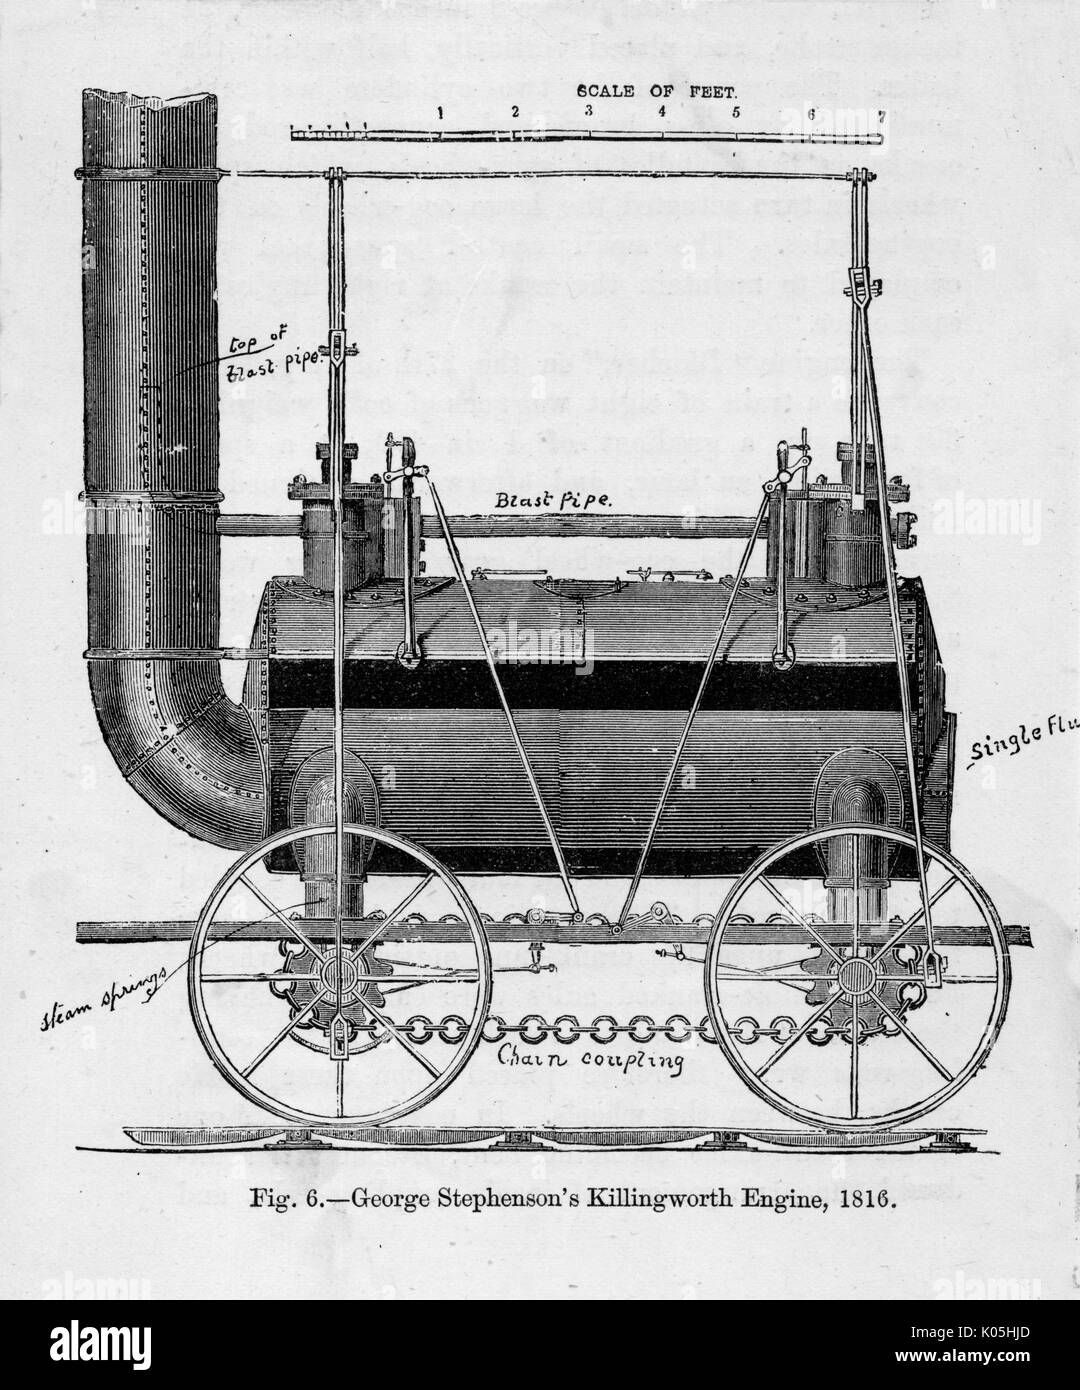 Killingworth locomotive         Date: 1816 Stock Photo